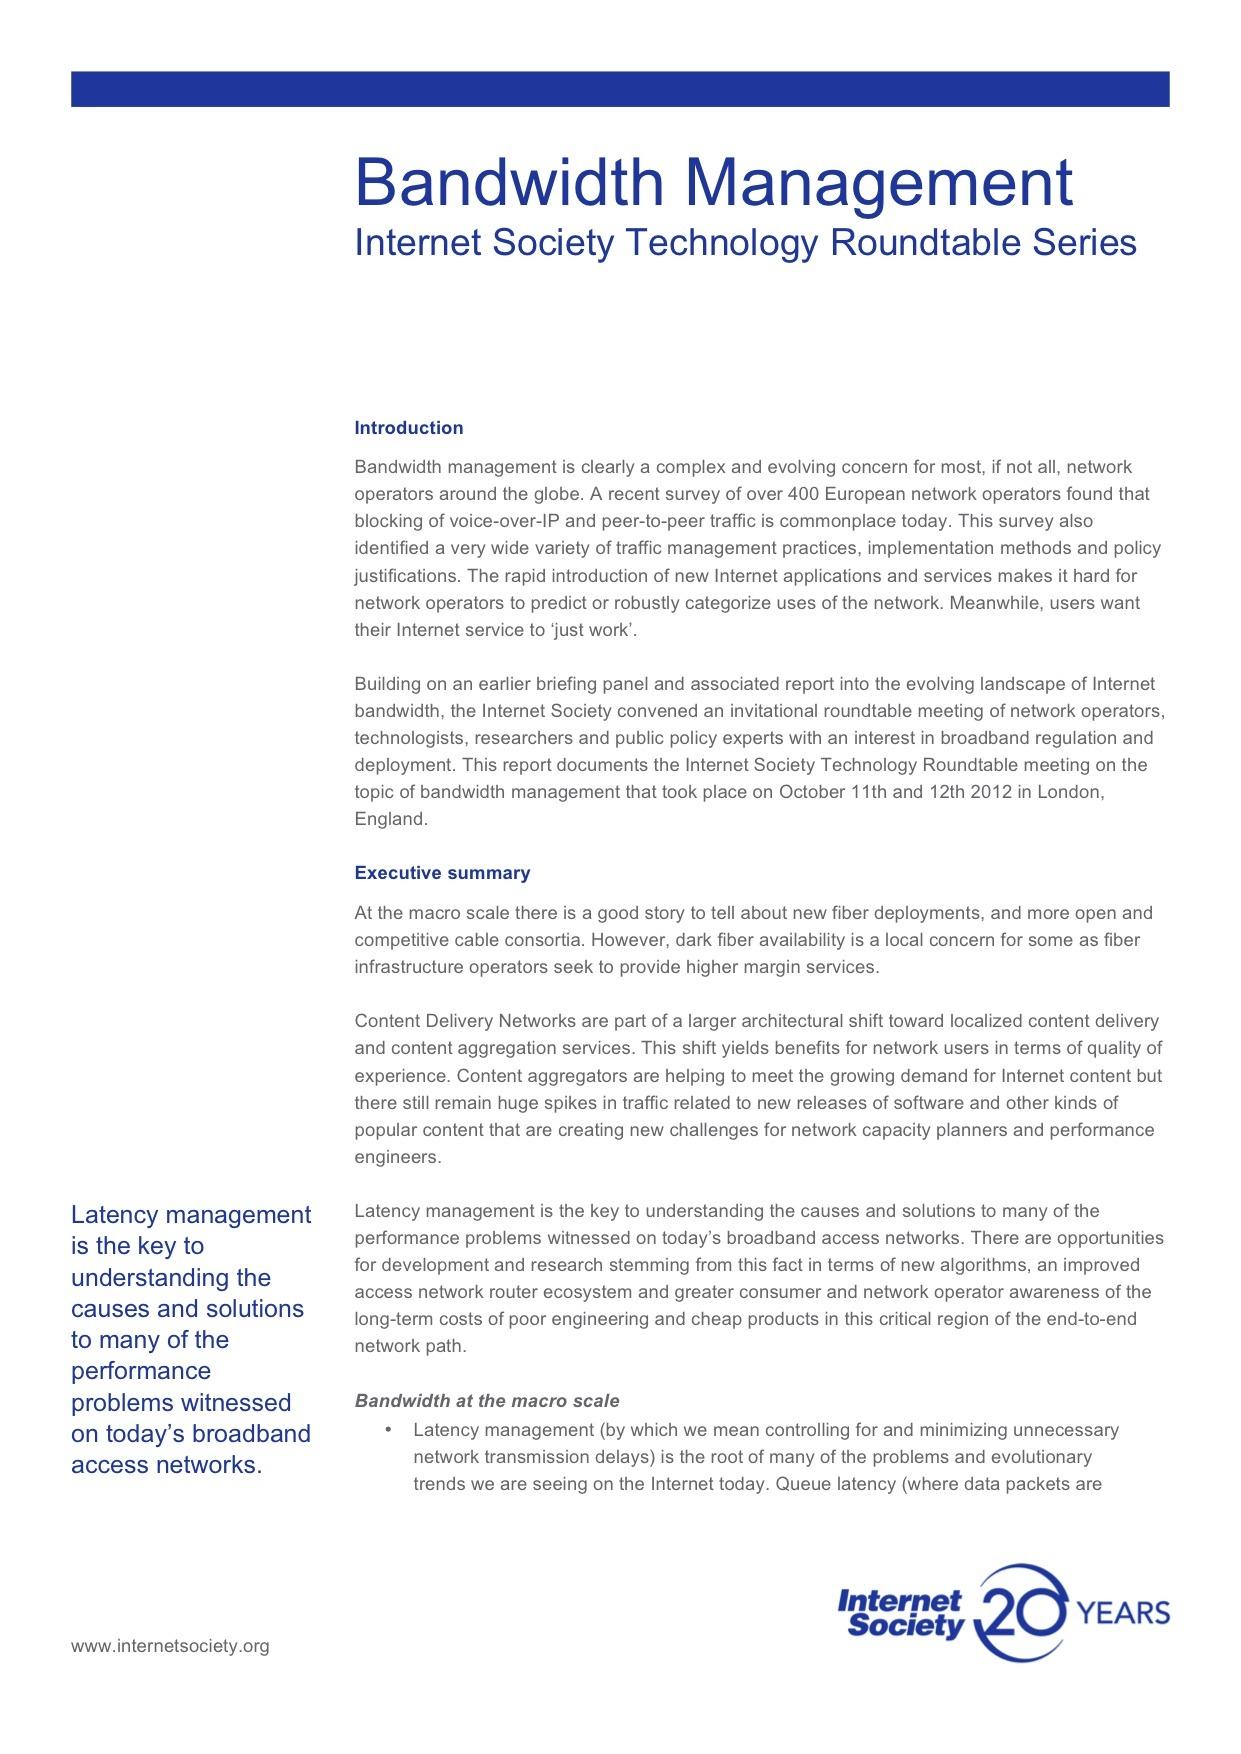 Bandwidth Management: Internet Society Technology Roundtable Series Thumbnail